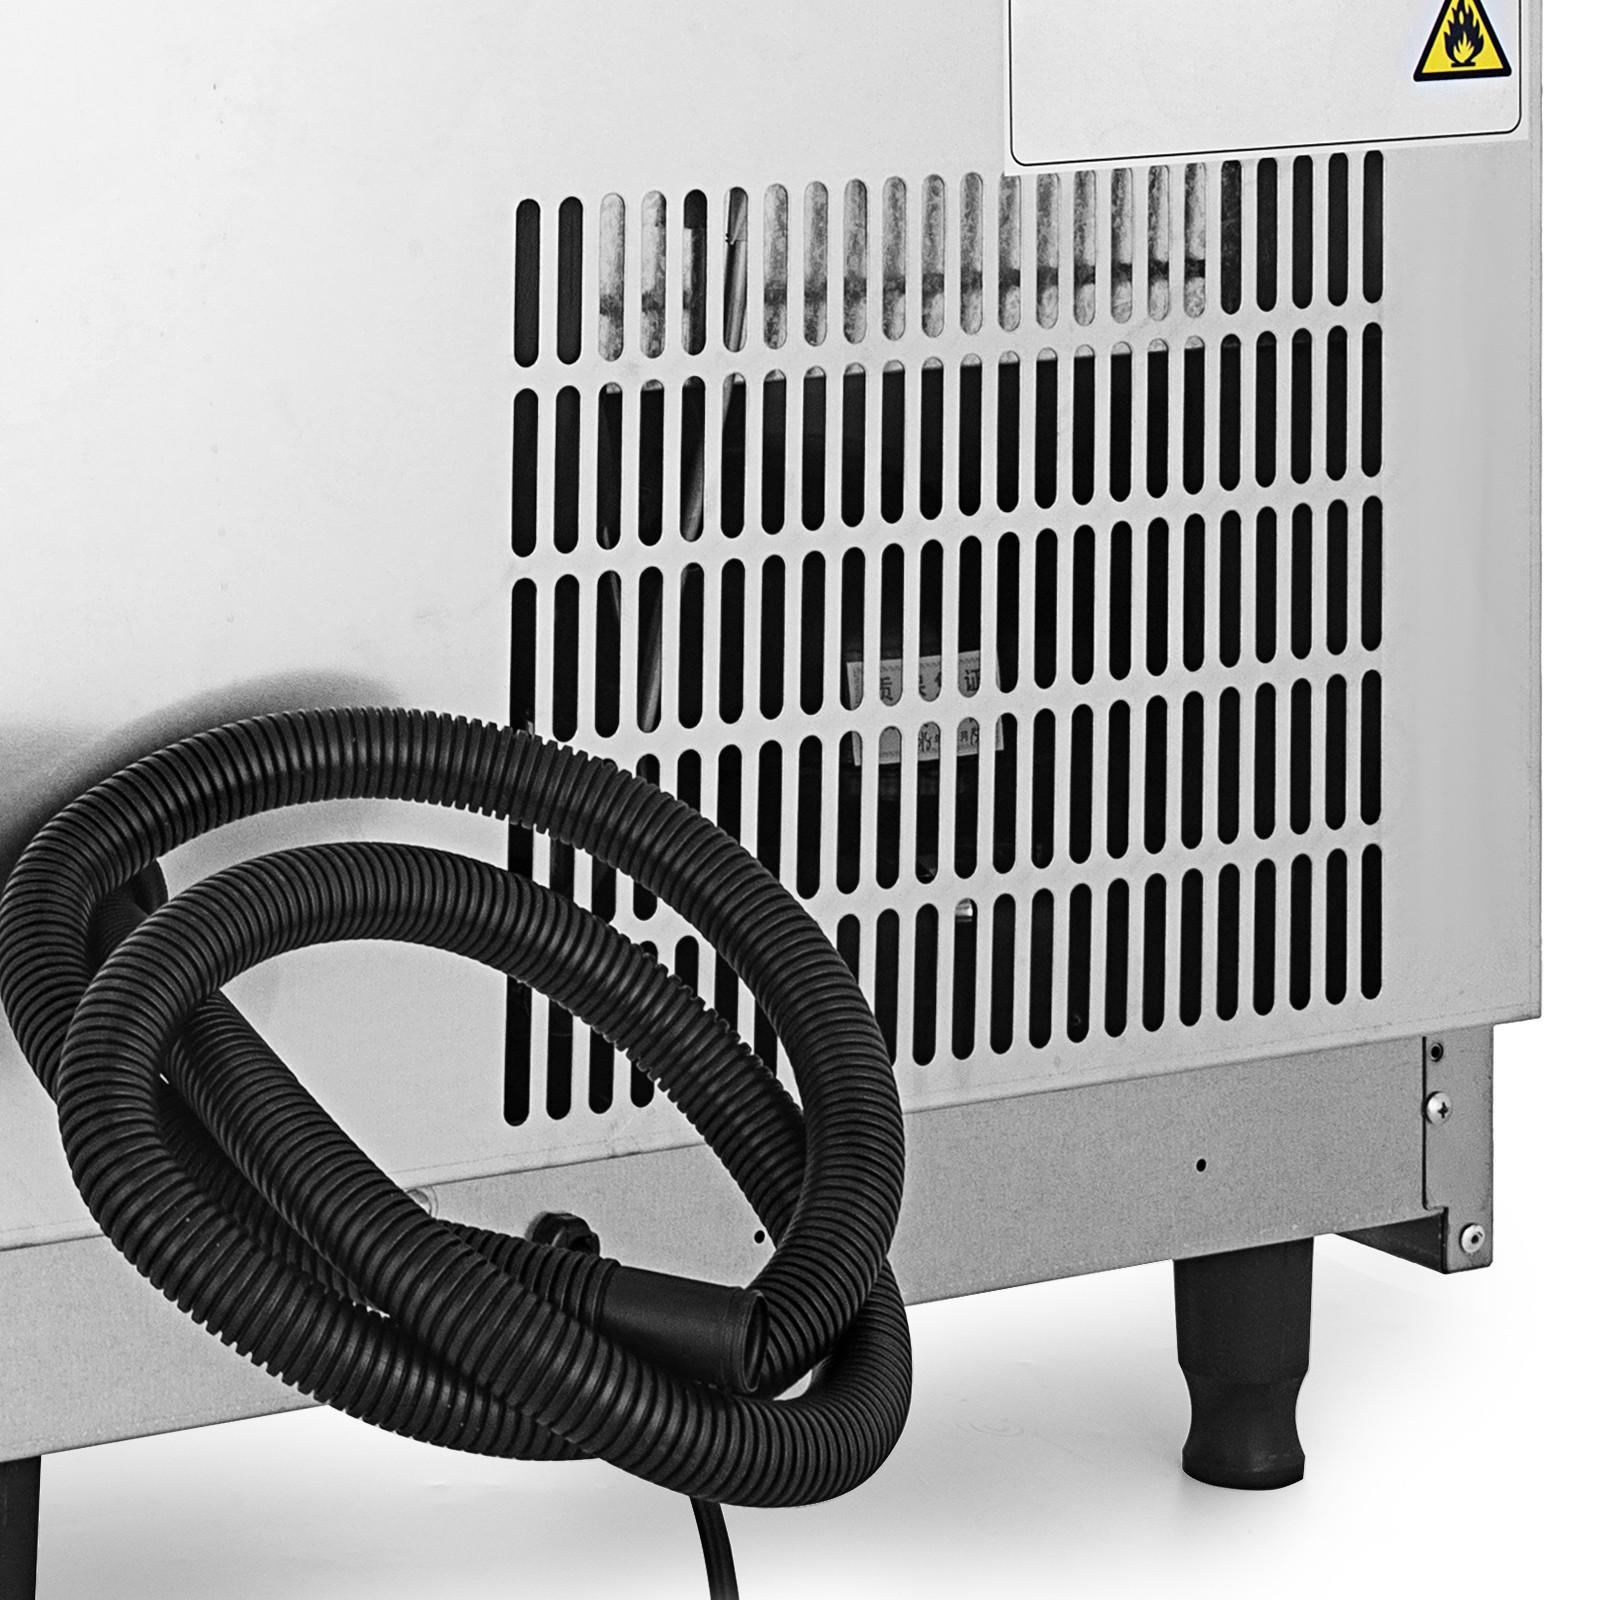 40-55-KG-Intelligent-Ice-Cube-Making-Machine-Bars-Heat-Insulation-Ice-Spoon thumbnail 47